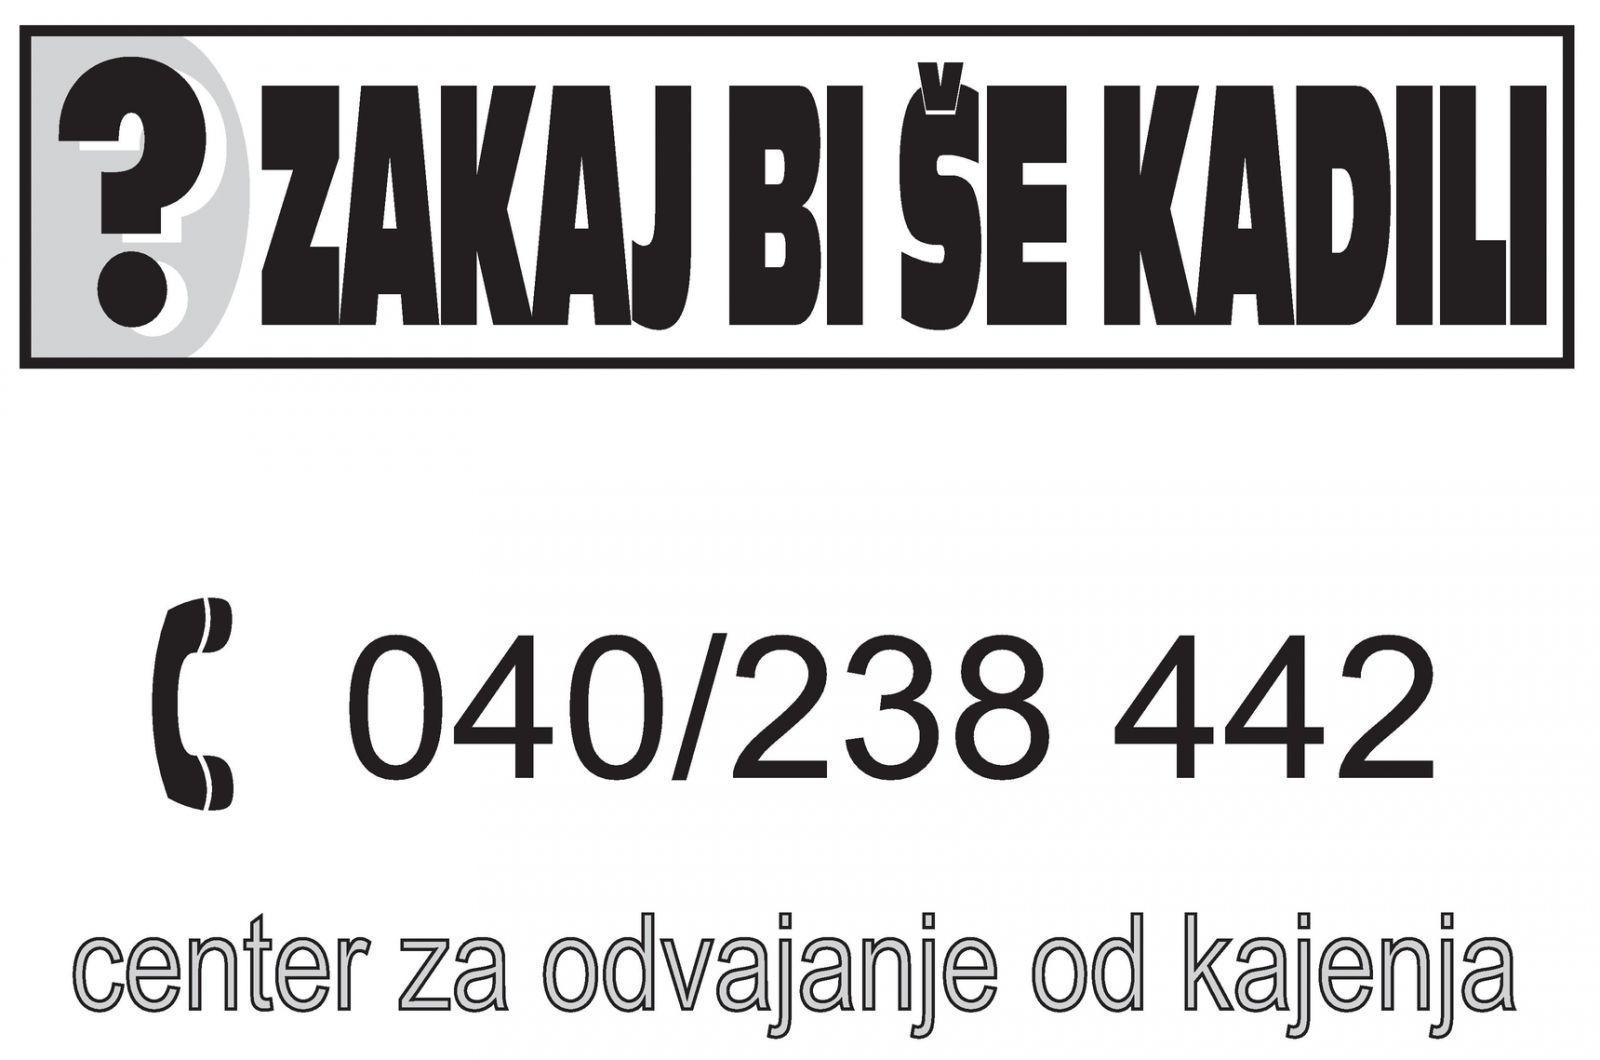 Odvajanje od cigaret, kako prenehati kaditi, Center za odvajanje od kajenja, Ljubljana, Maribor 001